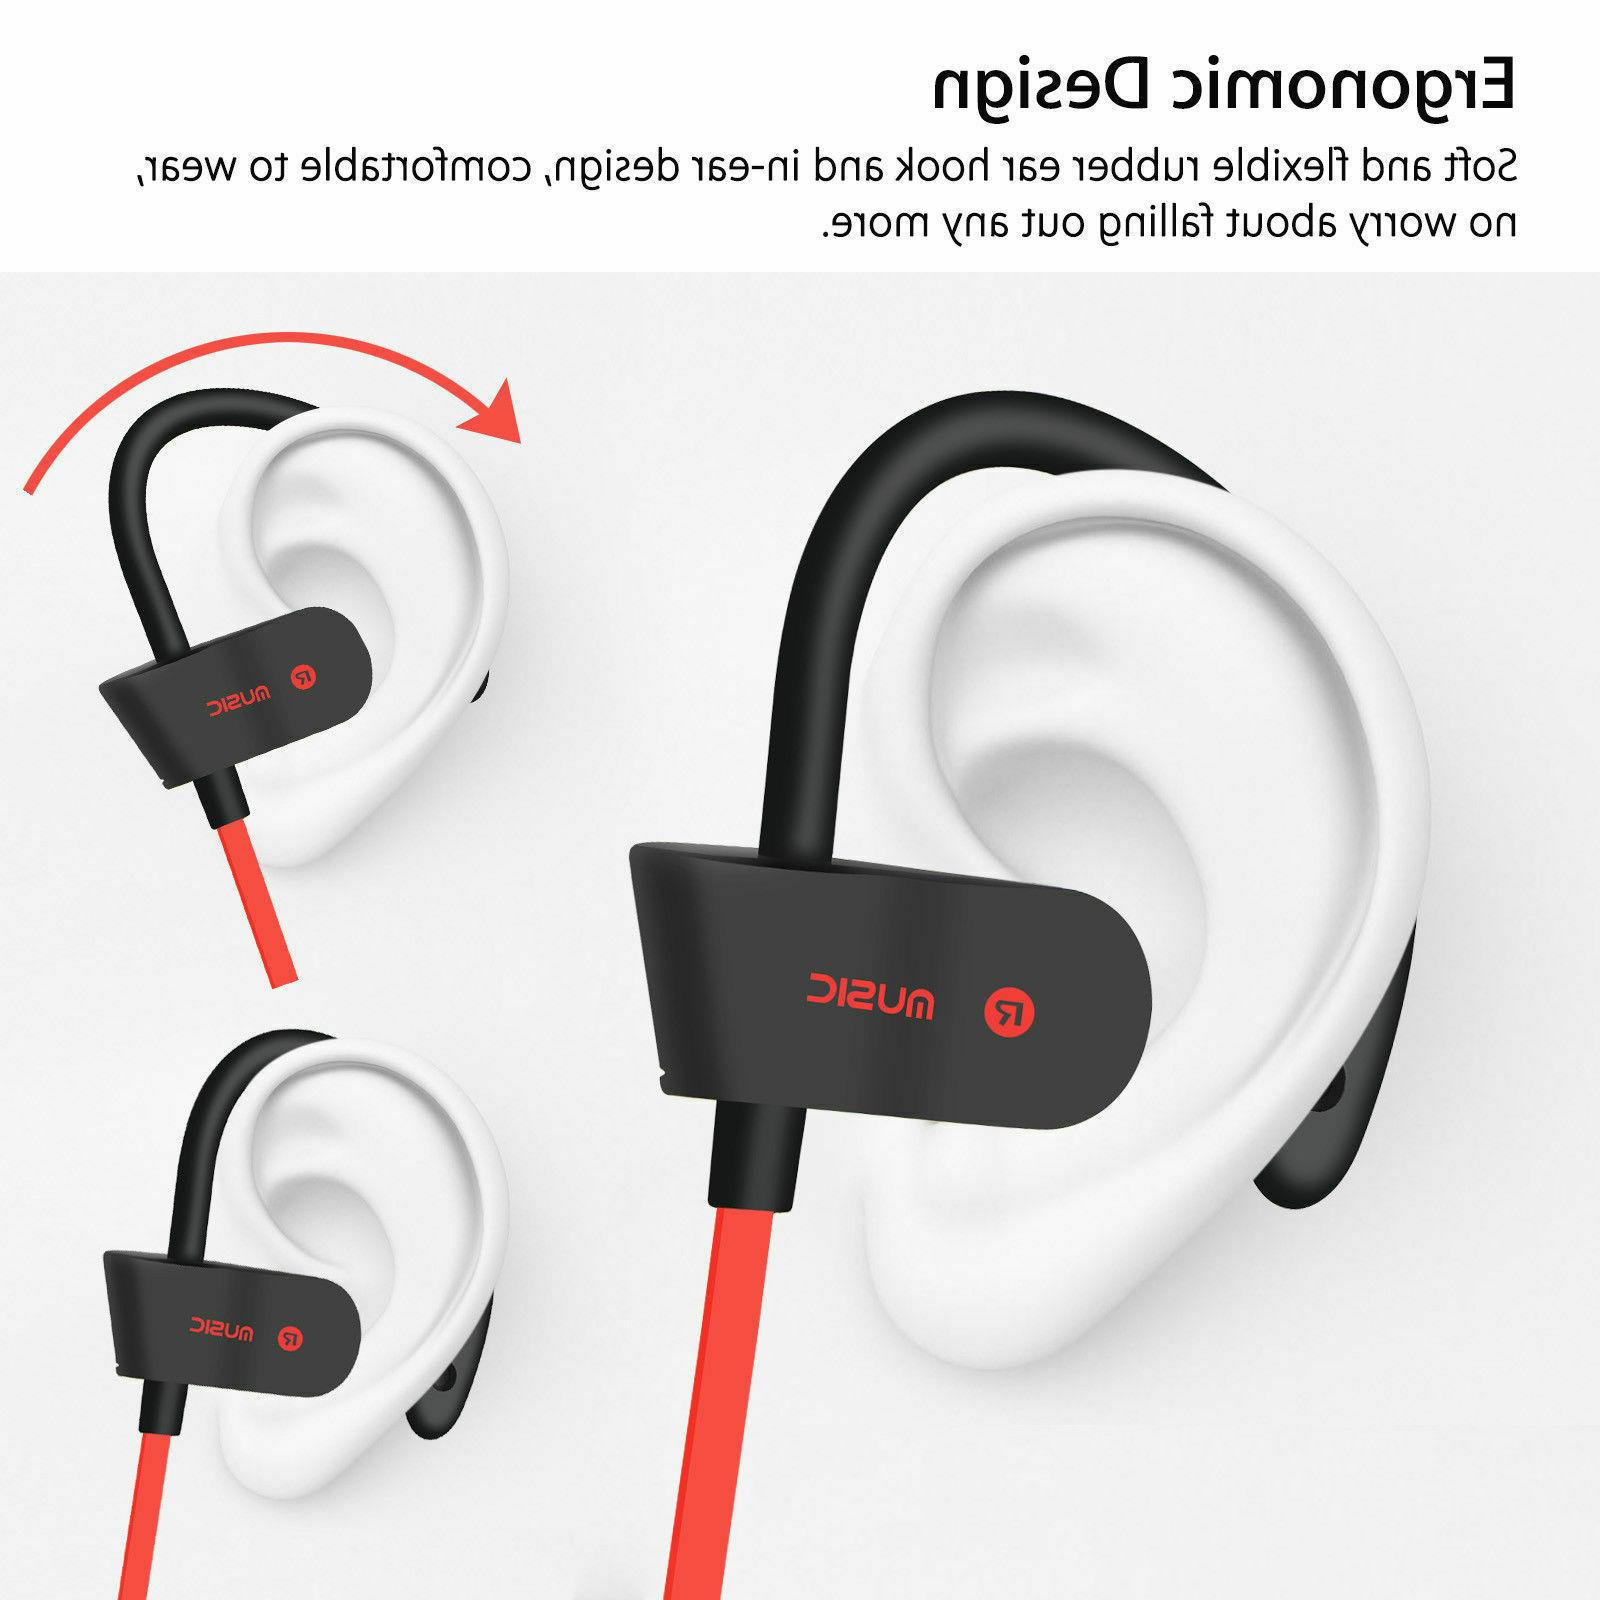 Sweatproof Headset Sport Stereo Earbuds